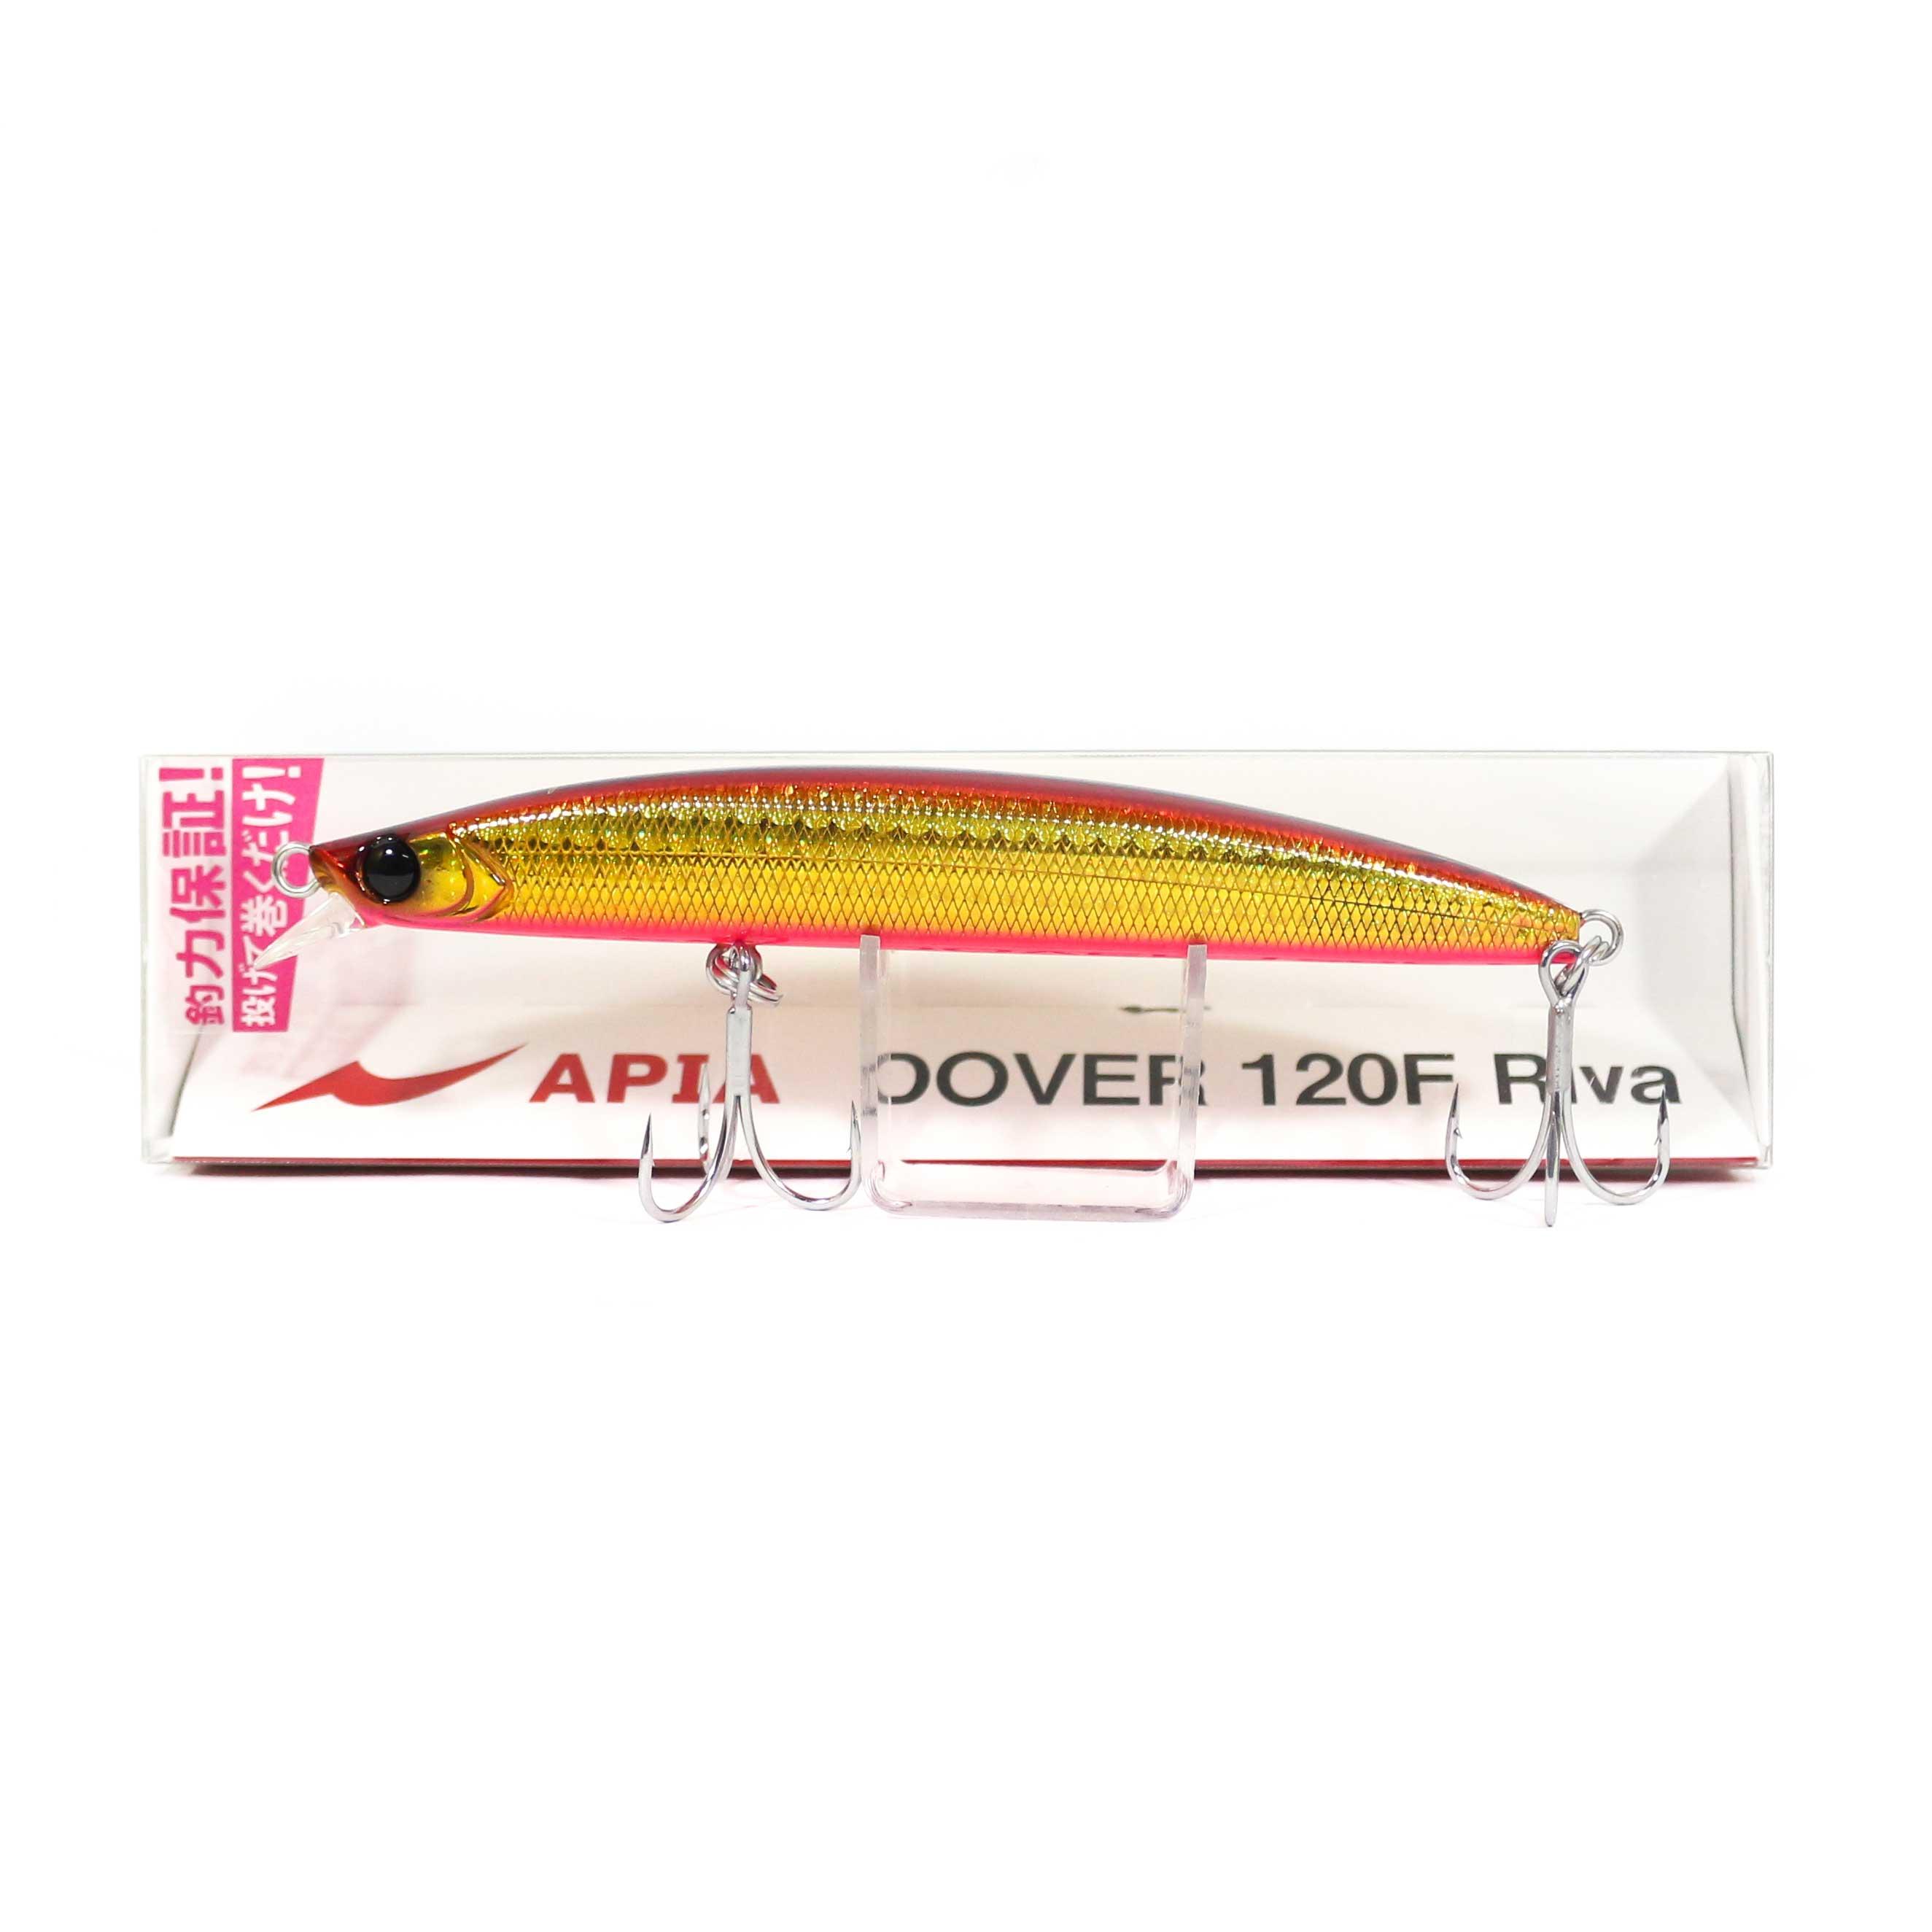 Apia Dover 120 F Riva Floating Lure 10 (7811)